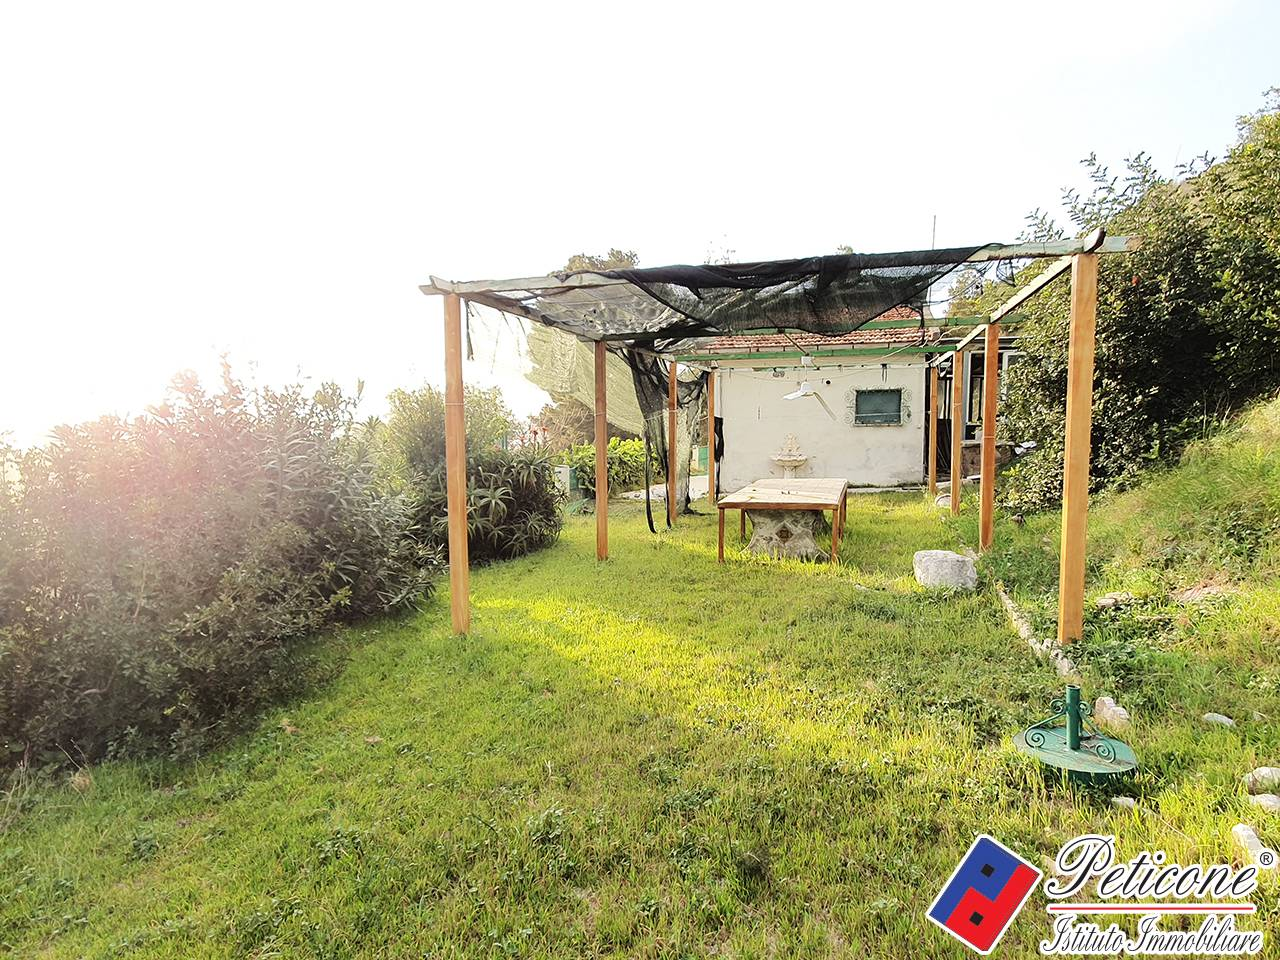 Villa in Vendita a Sperlonga: 3 locali, 50 mq - Foto 13